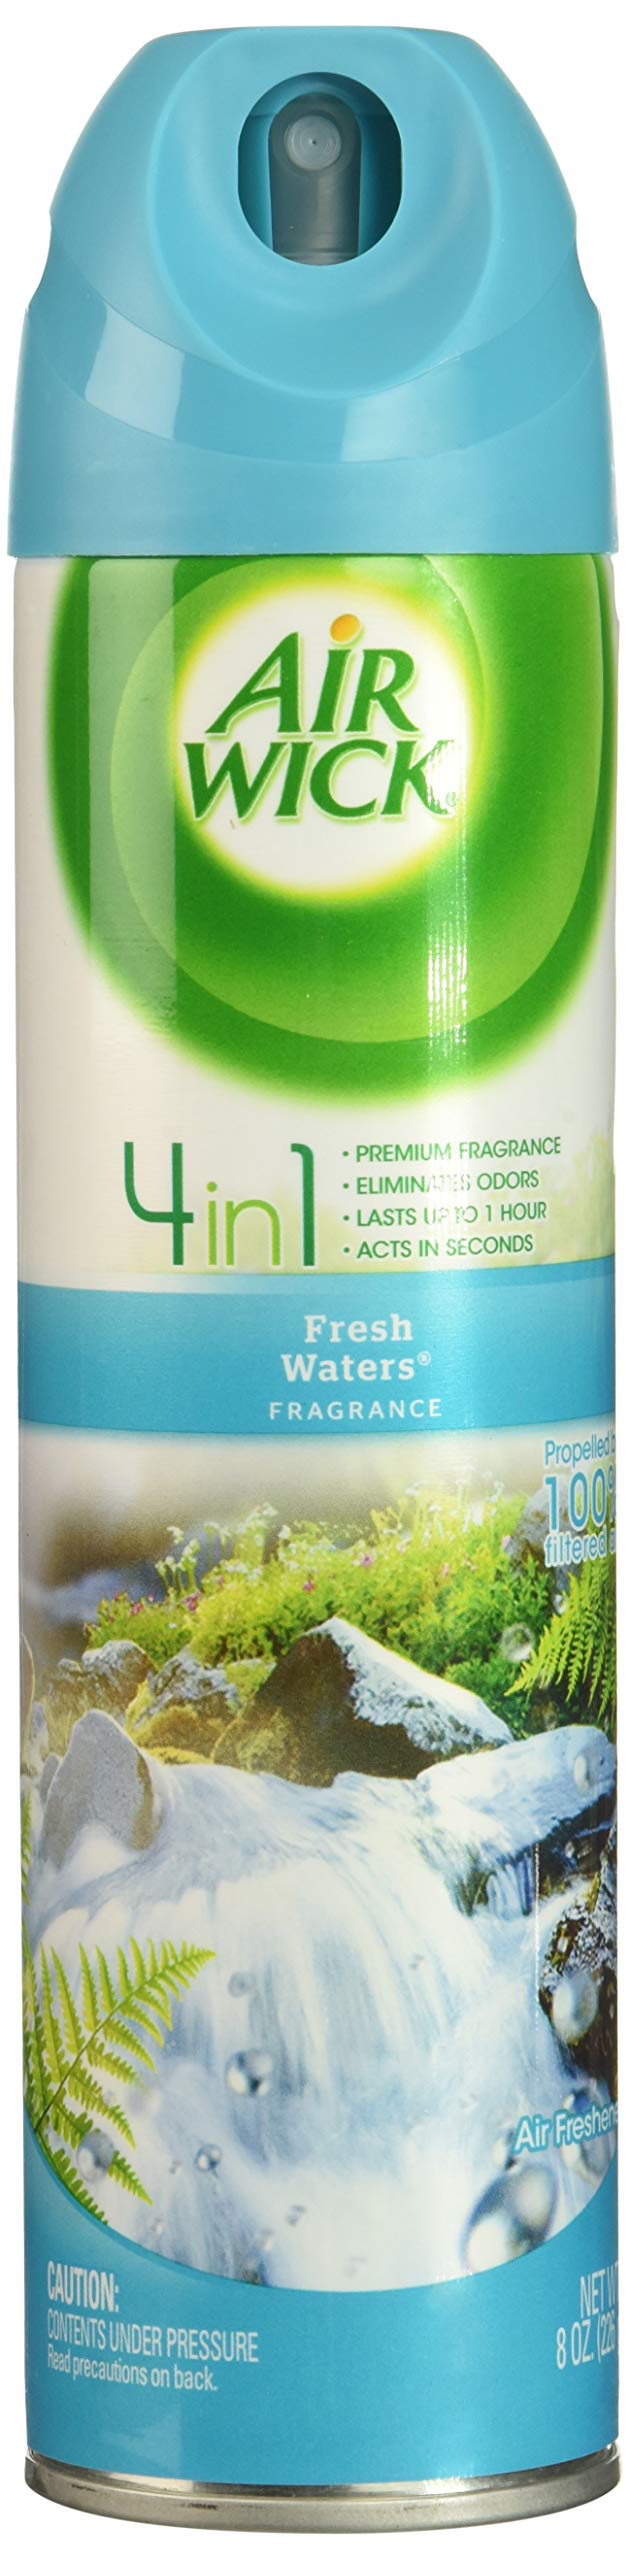 Air Wick Aerosol Spray Air Freshener, Fresh Waters, 8 oz (Pack of 24)